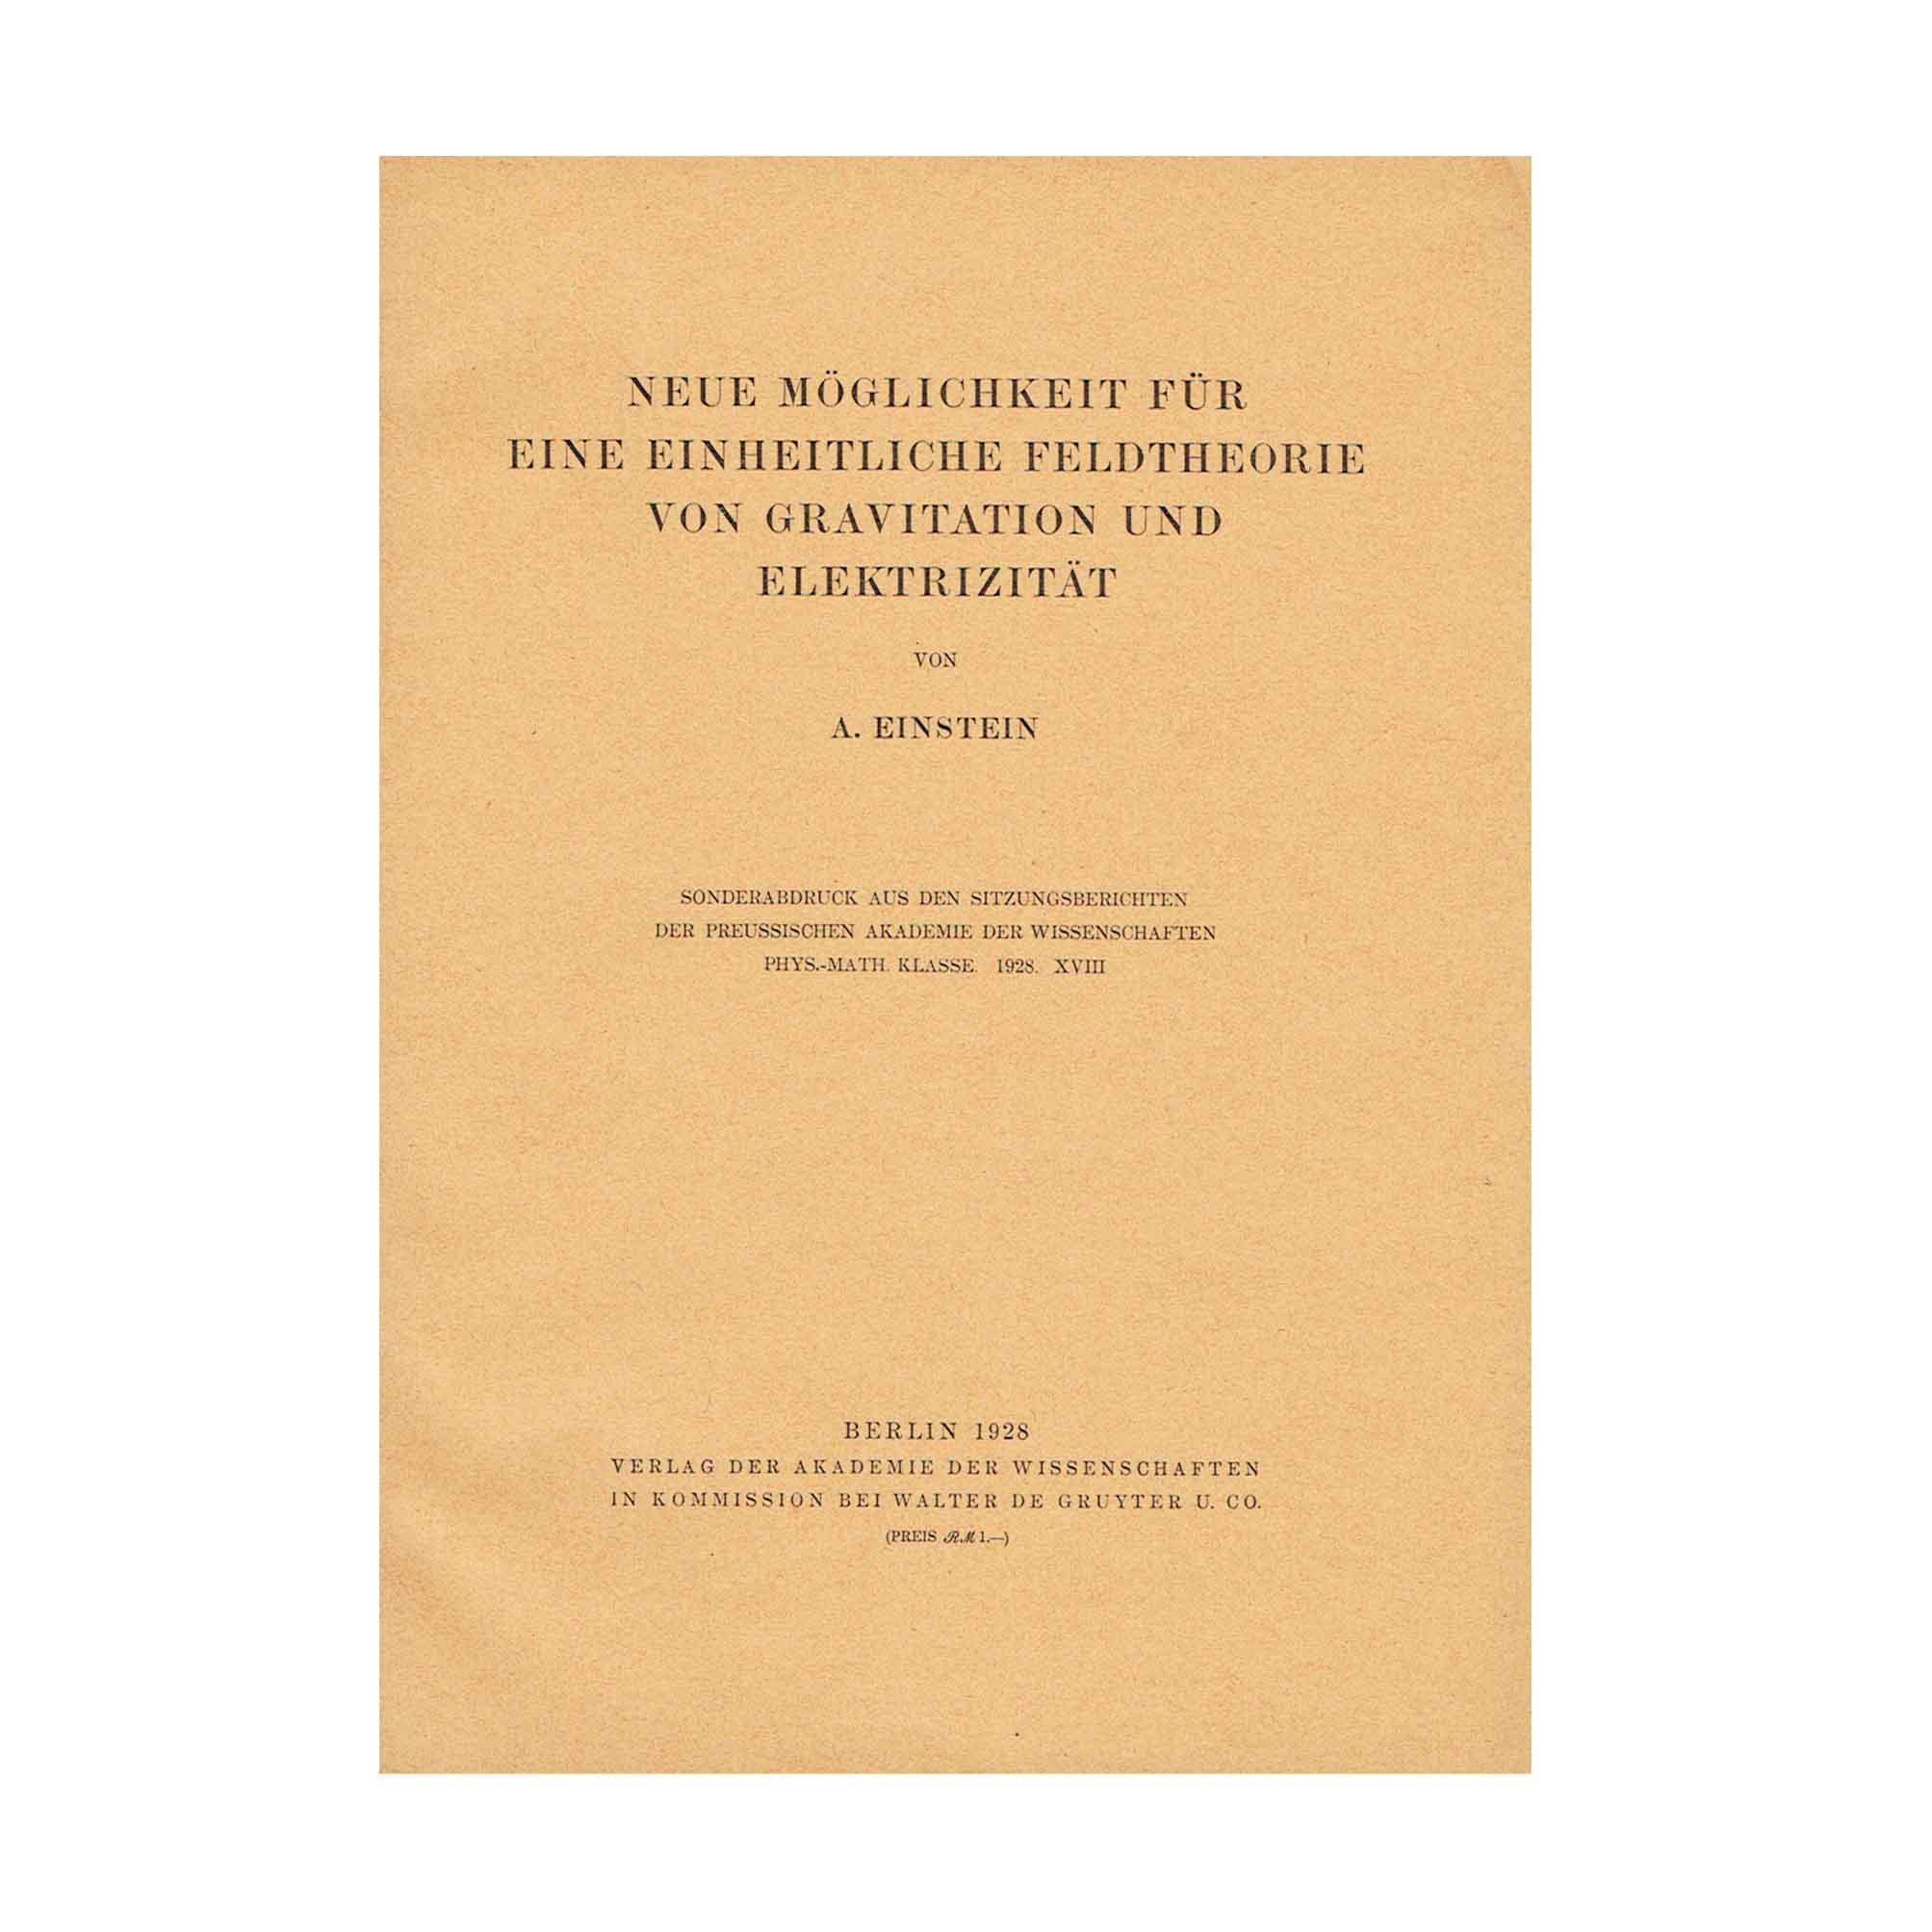 5738-Field-Theory-and-Electricity-Akademie-XVIII-1929-SA-Cover-recto-N.jpg